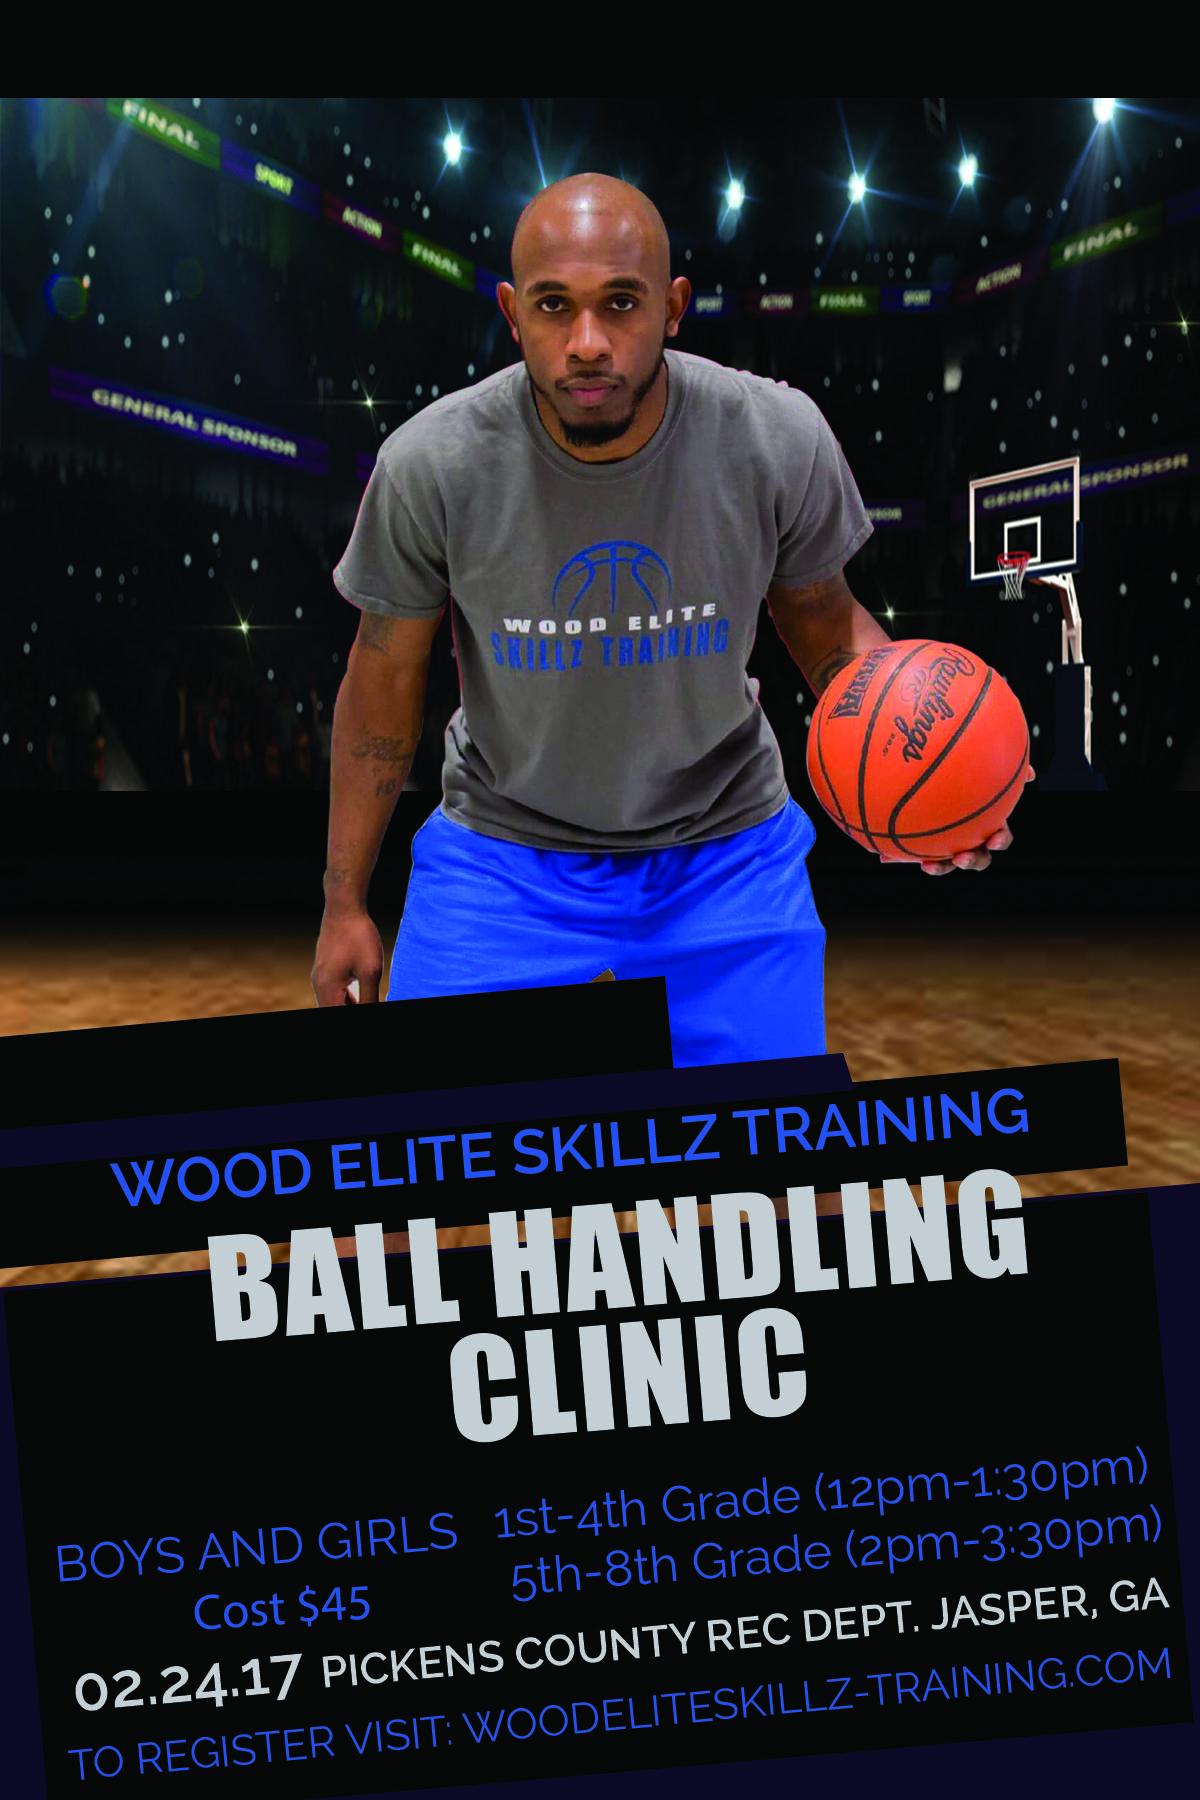 Wood Elite Skillz Ball Handling Clinic